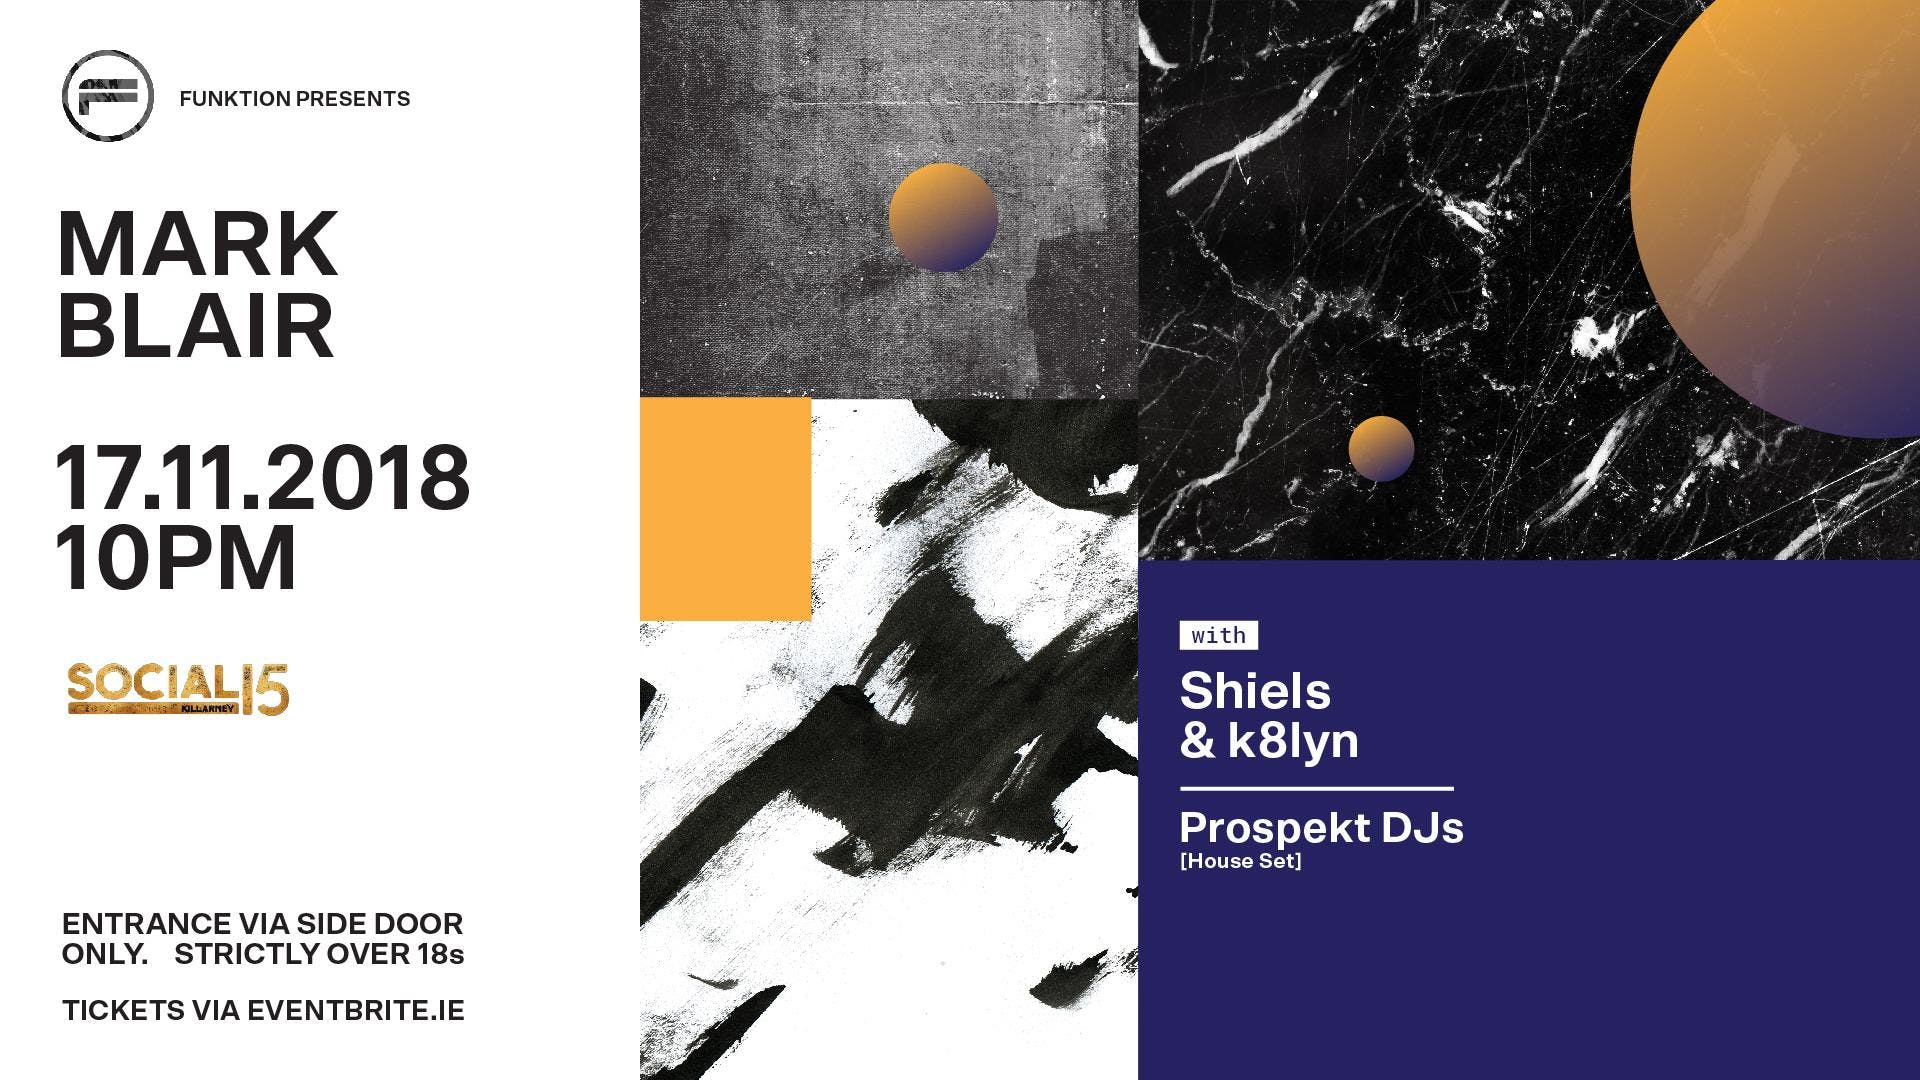 Funktion presents MARK BLAIR// Shiels & k8lyn & Prospekt DJs